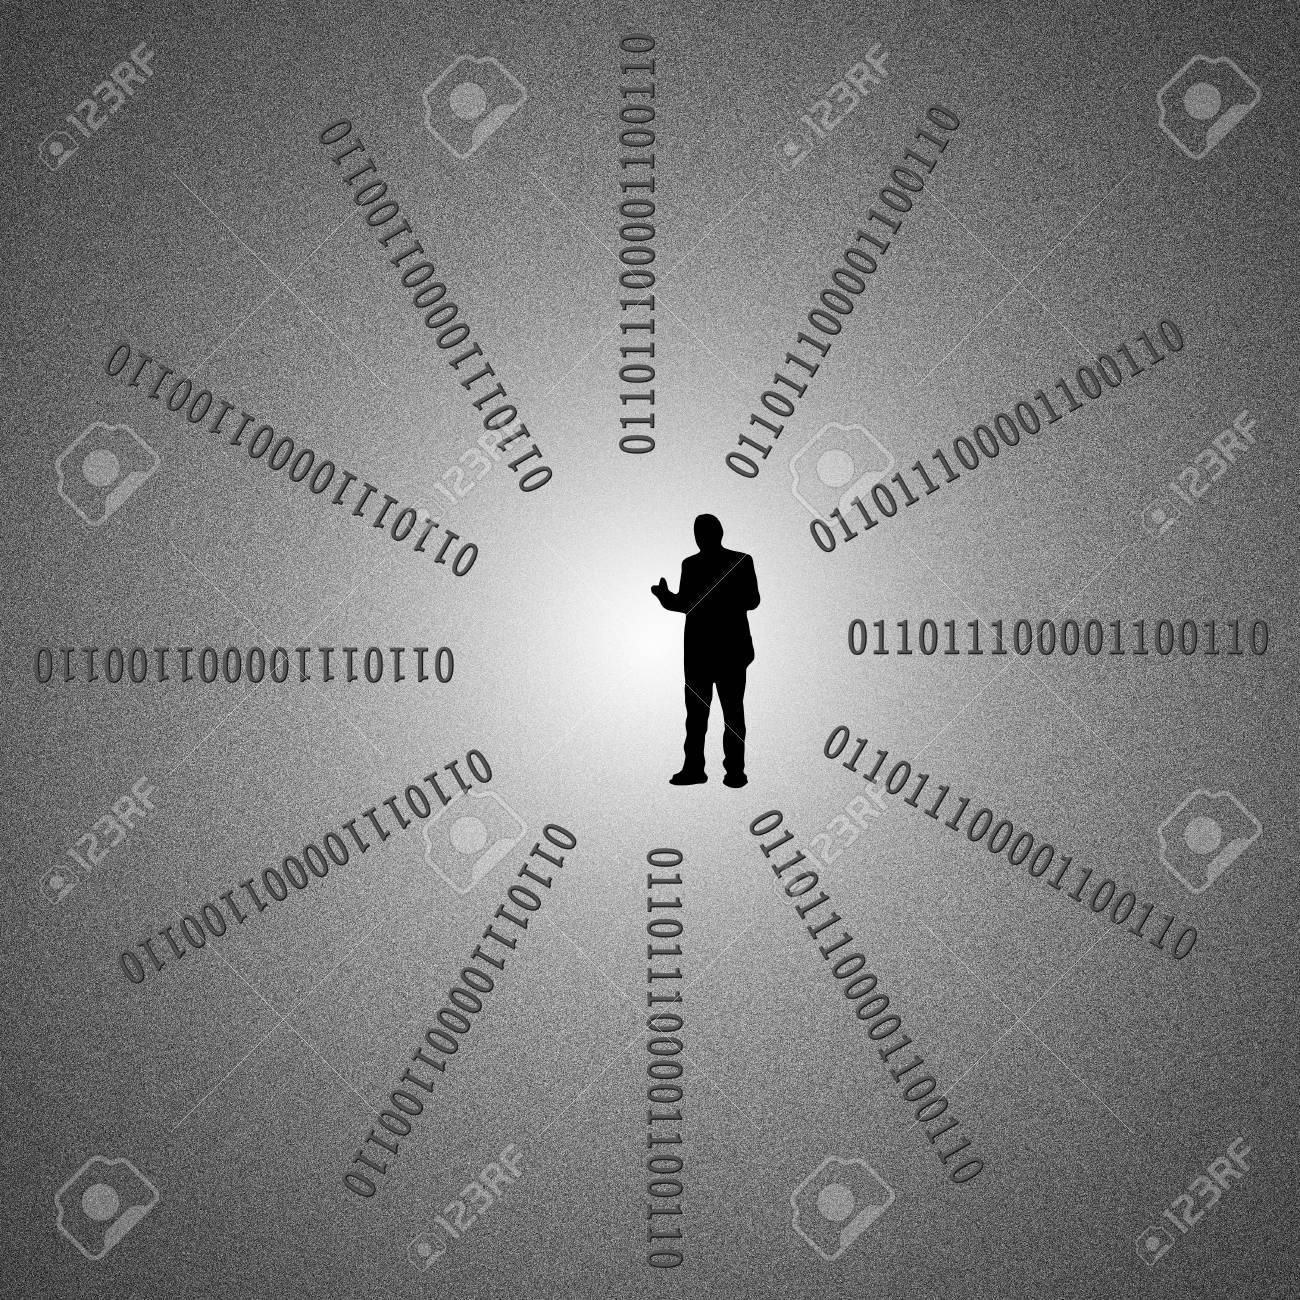 Binary code on detail pixelated screen Stock Photo - 16882483